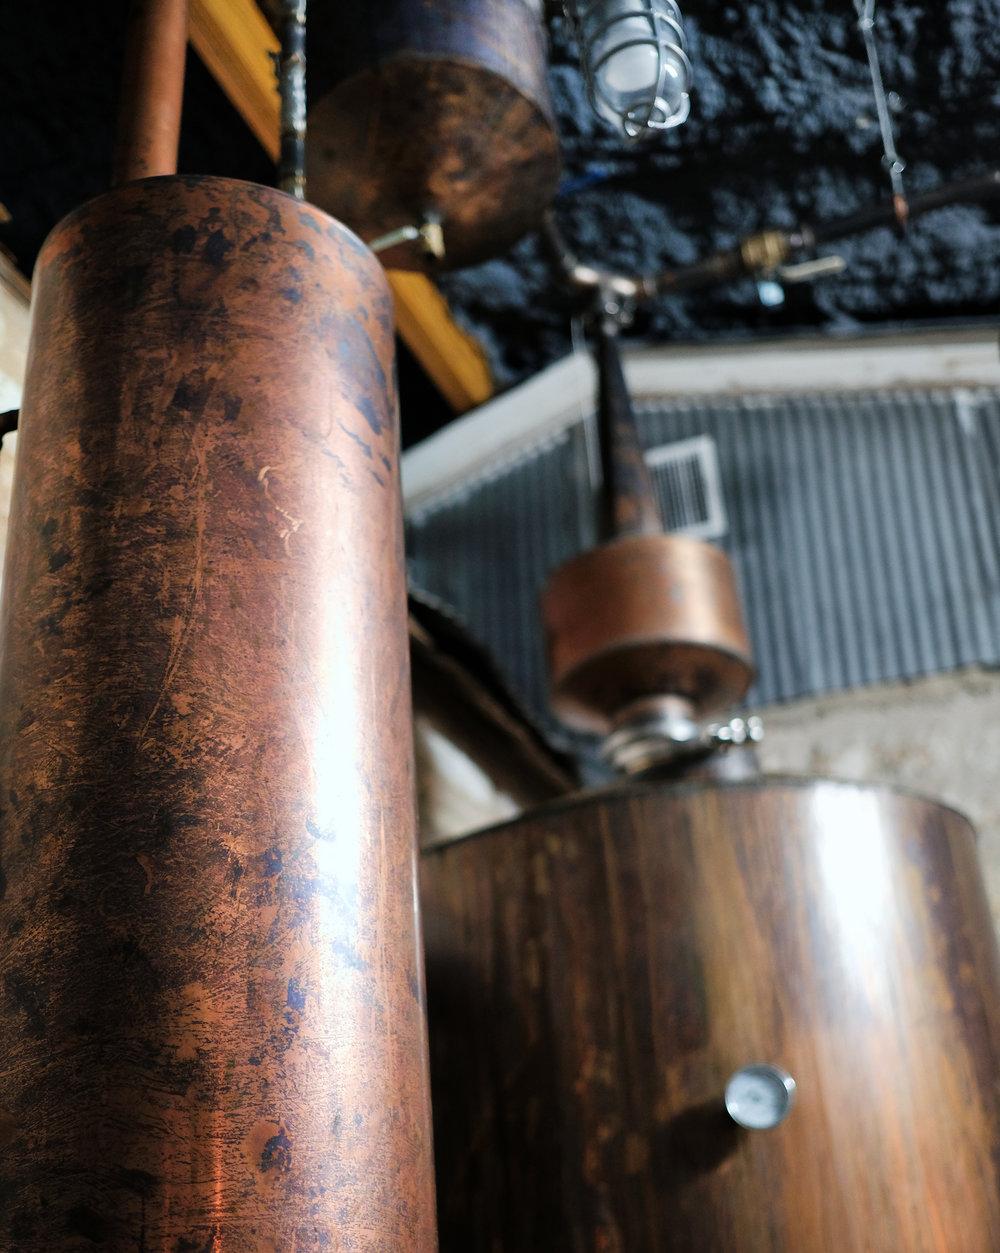 Copper Still at Elk Store & Distillery in Fredericksburg - Global Dish - Stephanie Arsenault